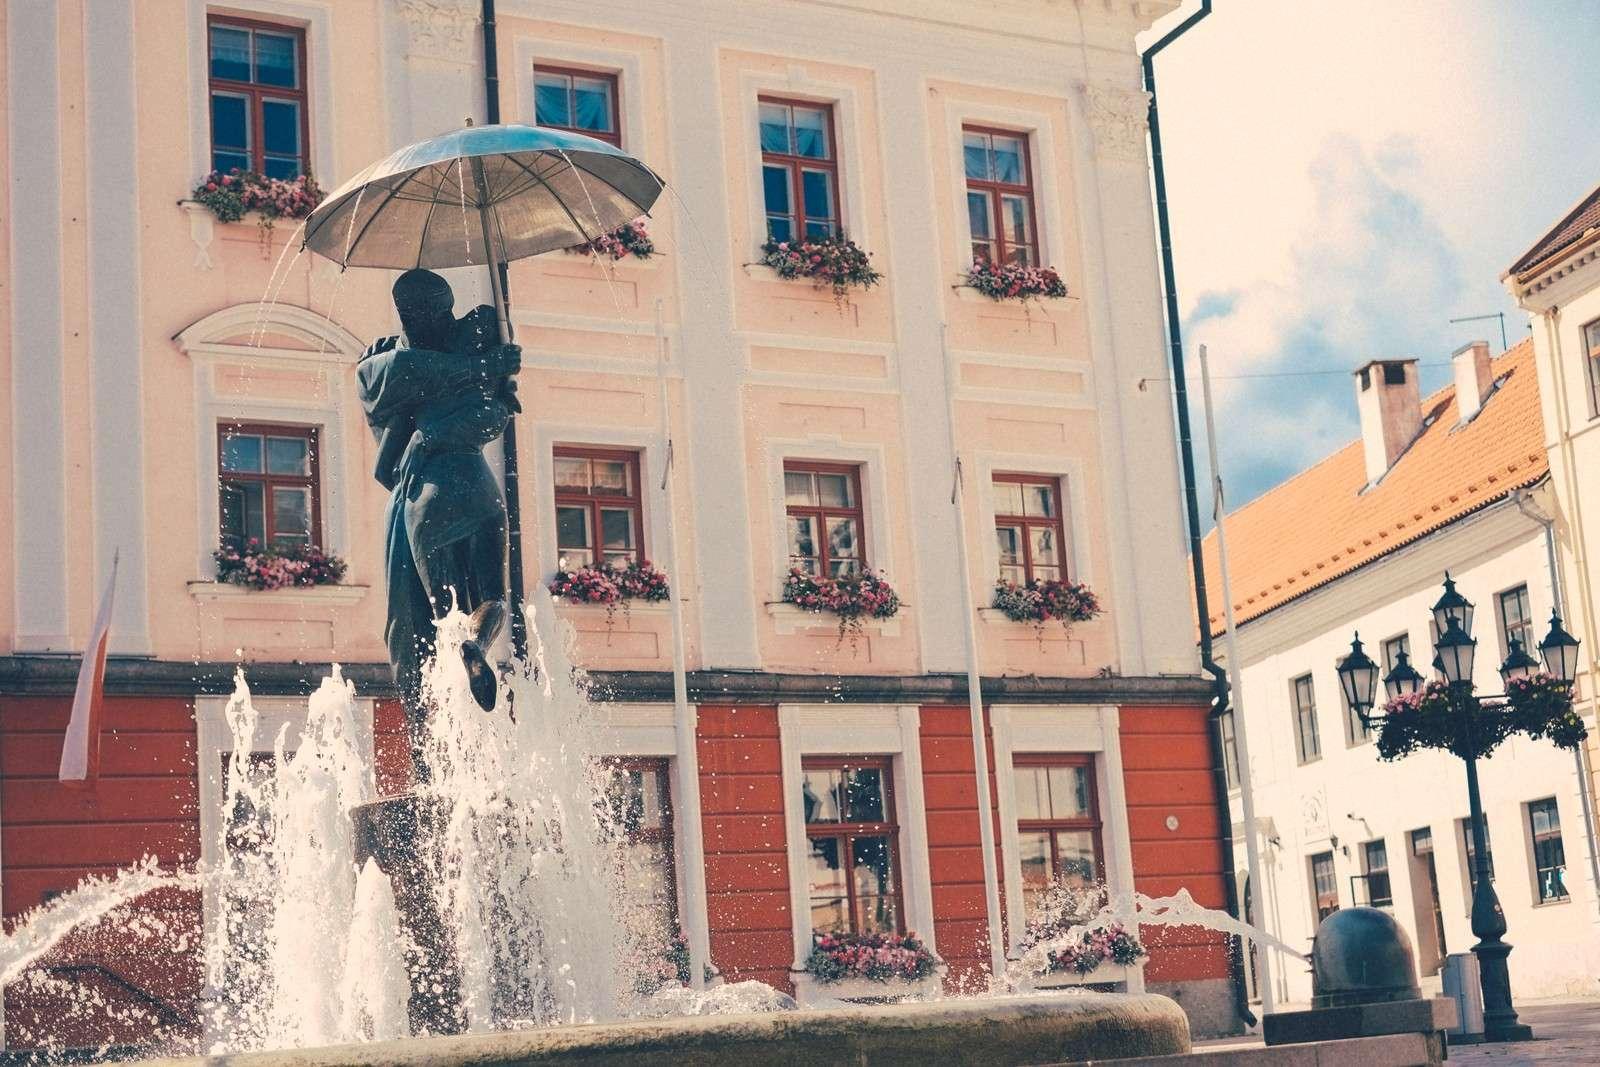 Daytrip from Tallinn to Tartu VisitTallinn